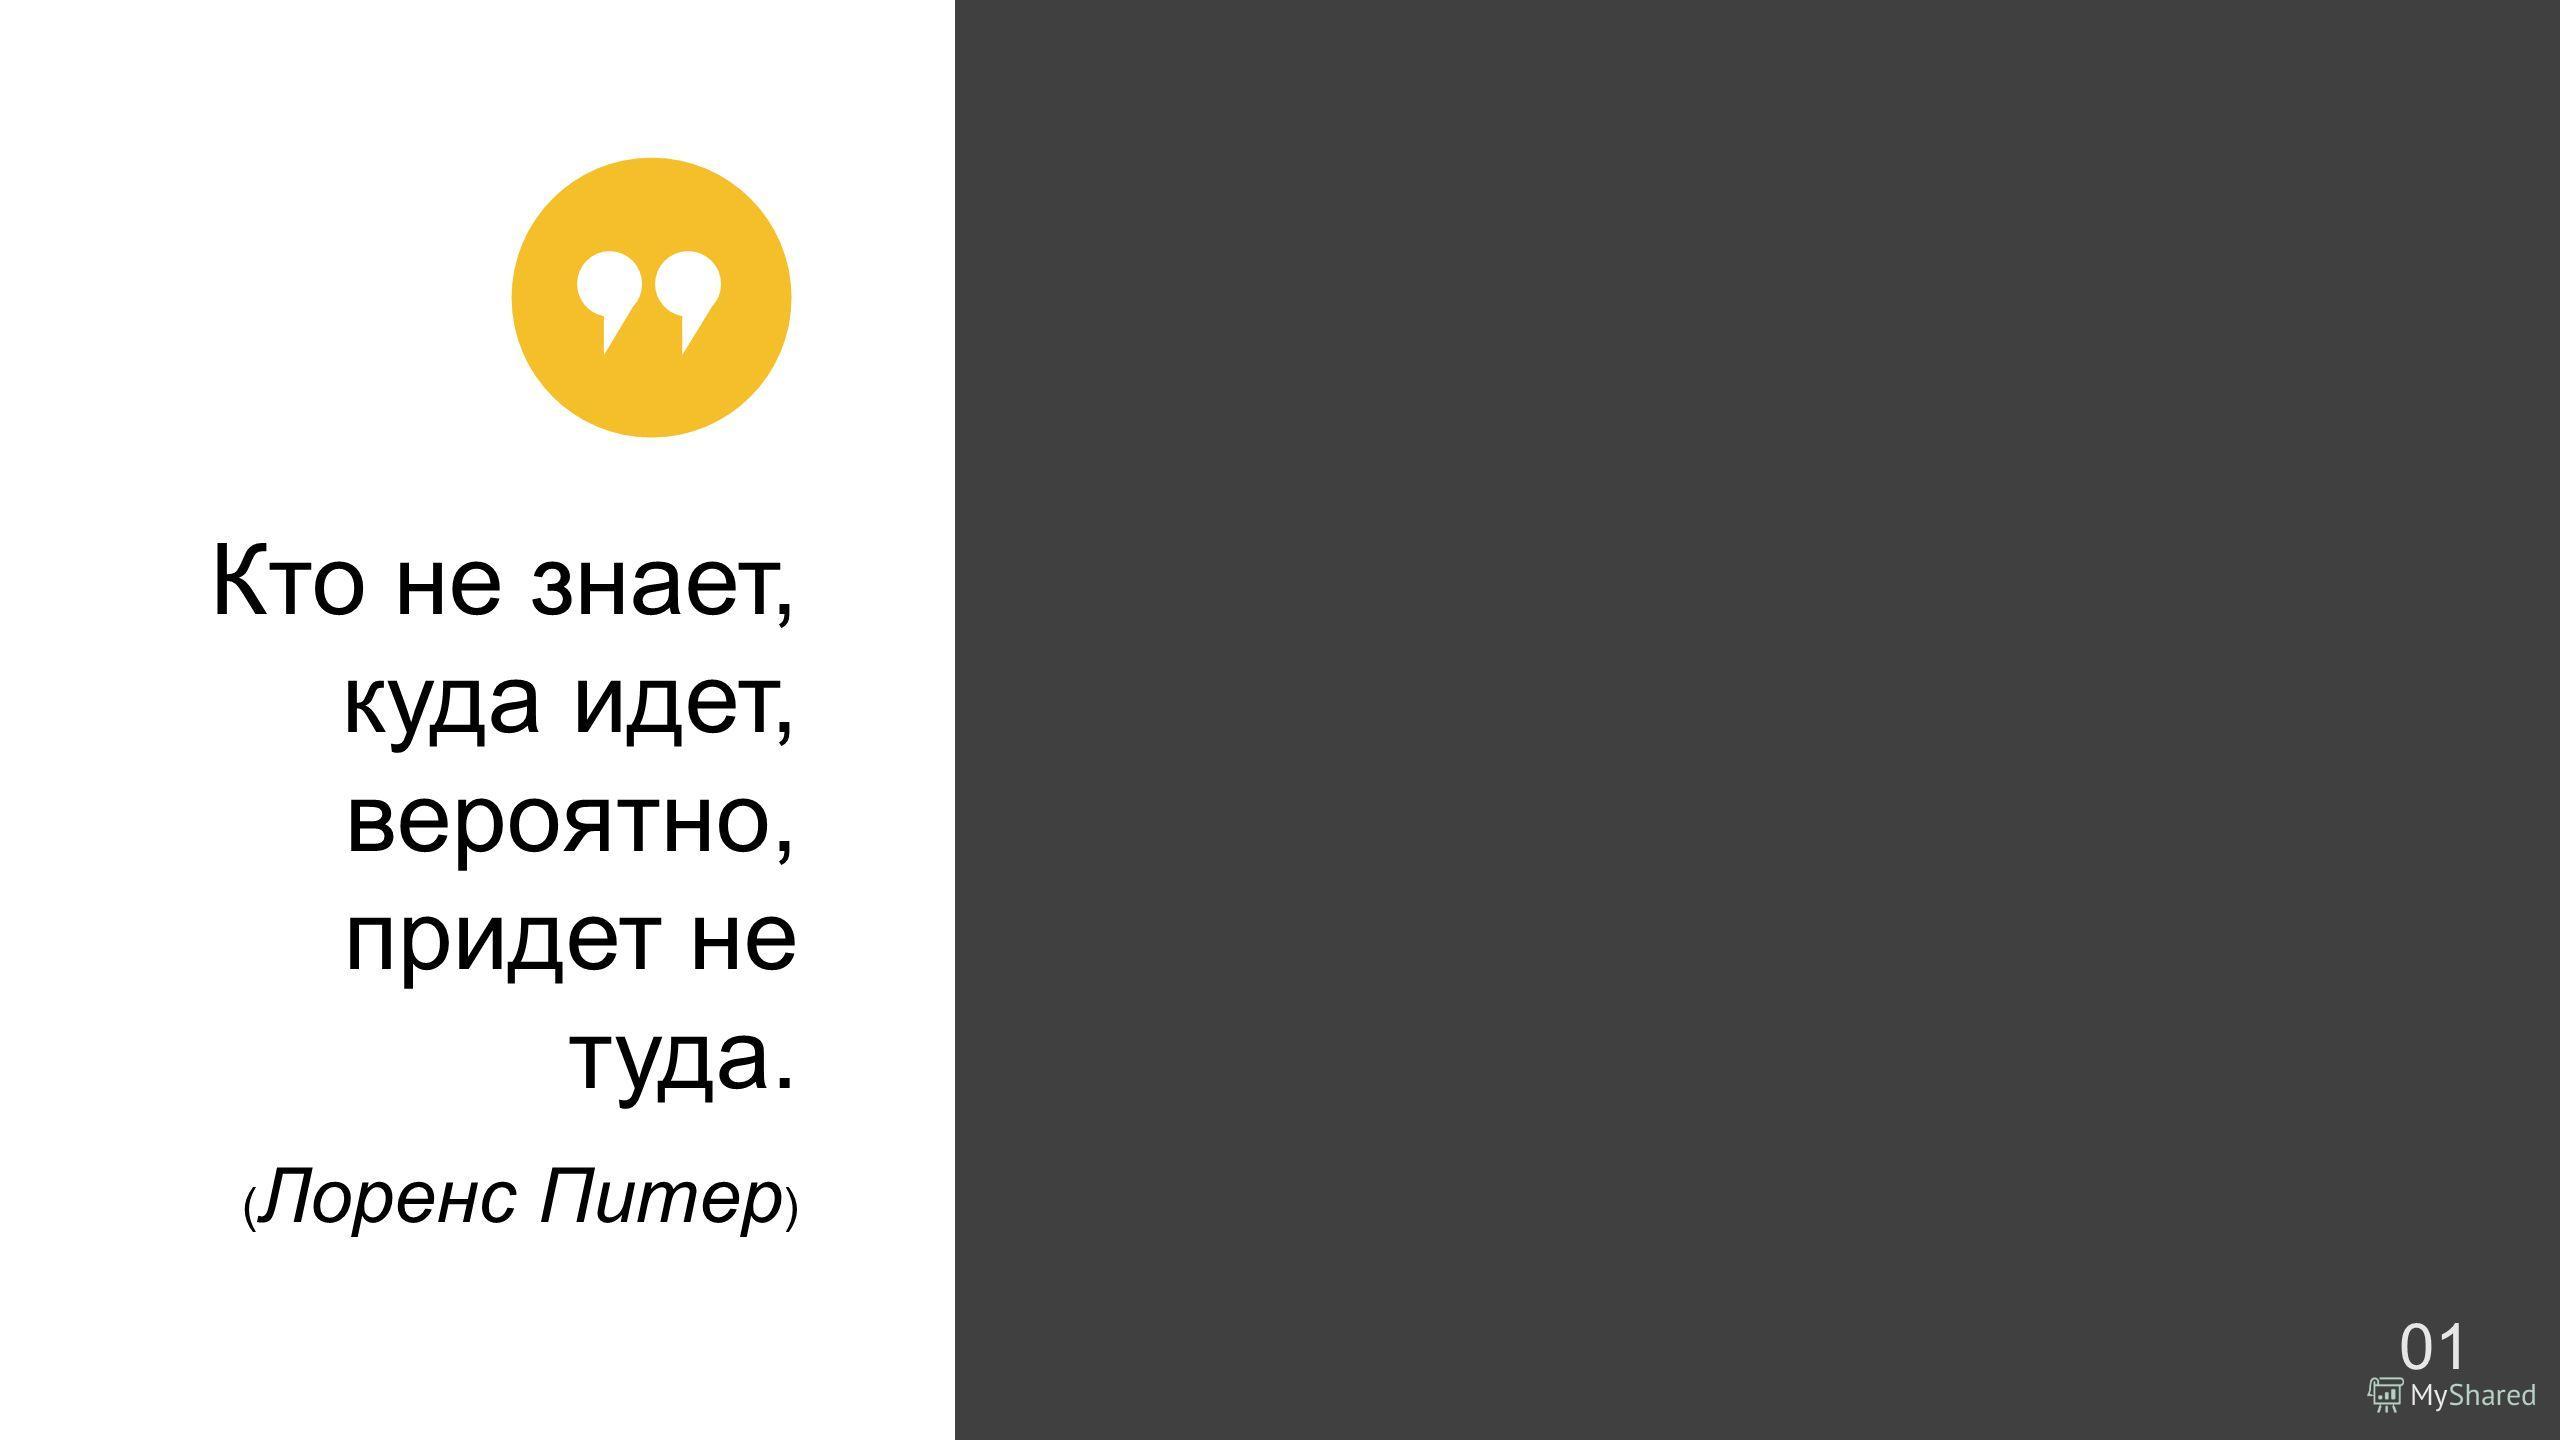 Company name - Presentation Кто не знает, куда идет, вероятно, придет не туда. ( Лоренс Питер ) 01